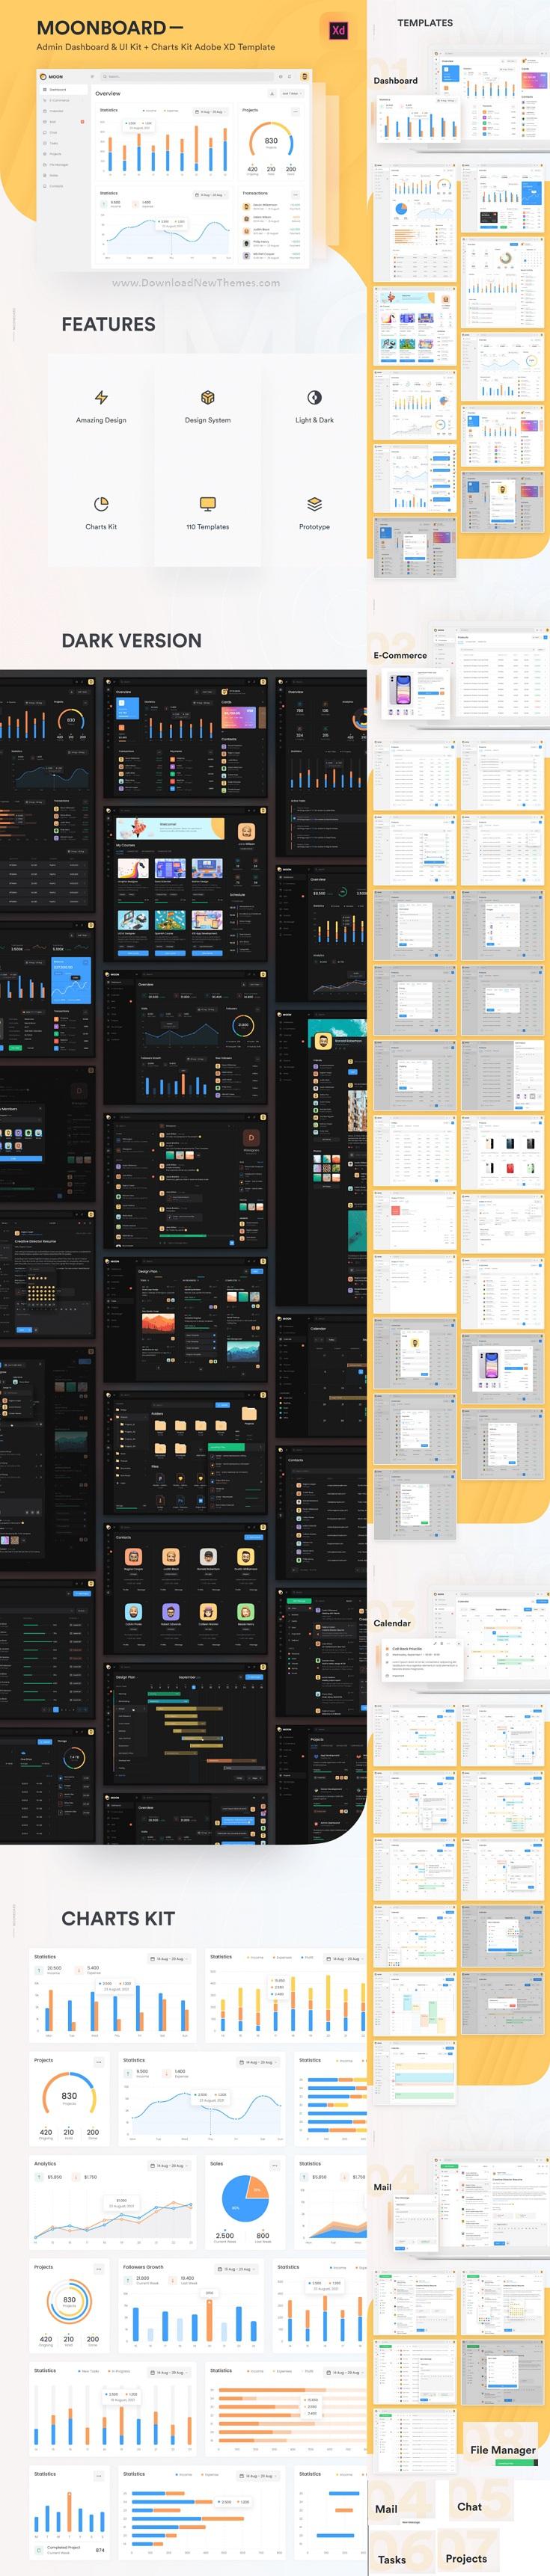 Premium Admin Dashboard & UI Kit + Charts Kit Adobe XD Template